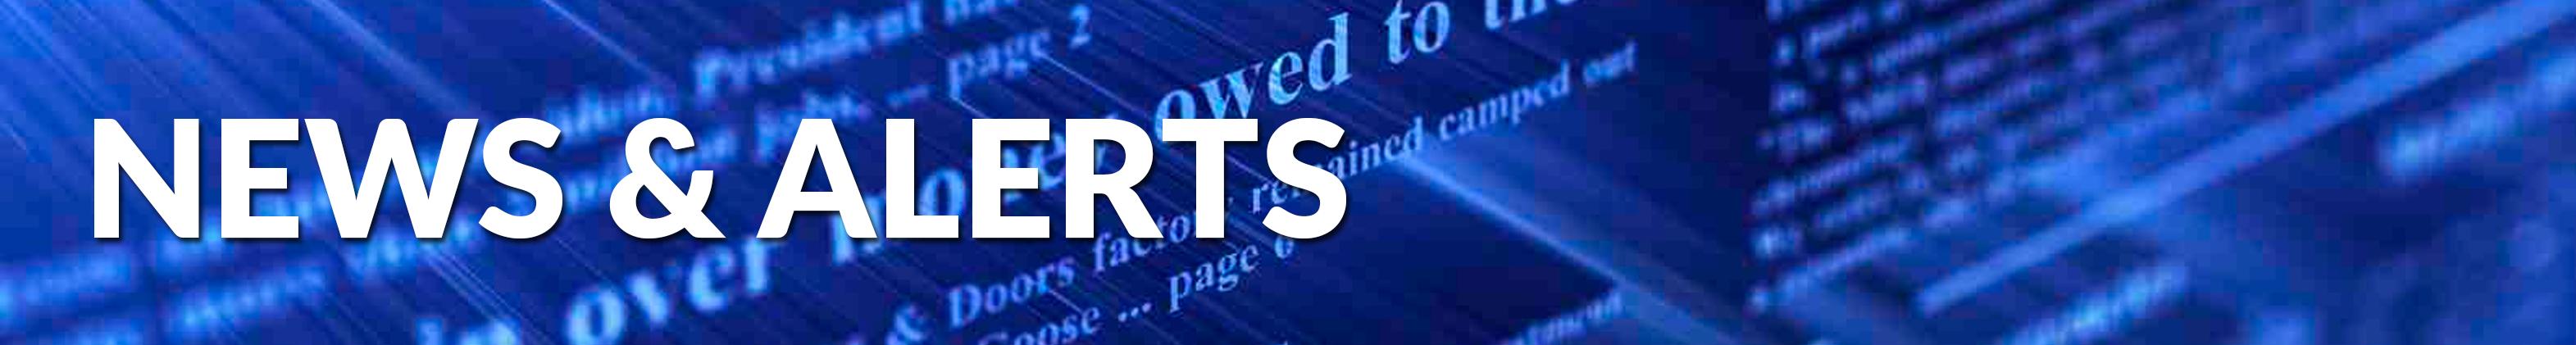 newsalerts_header